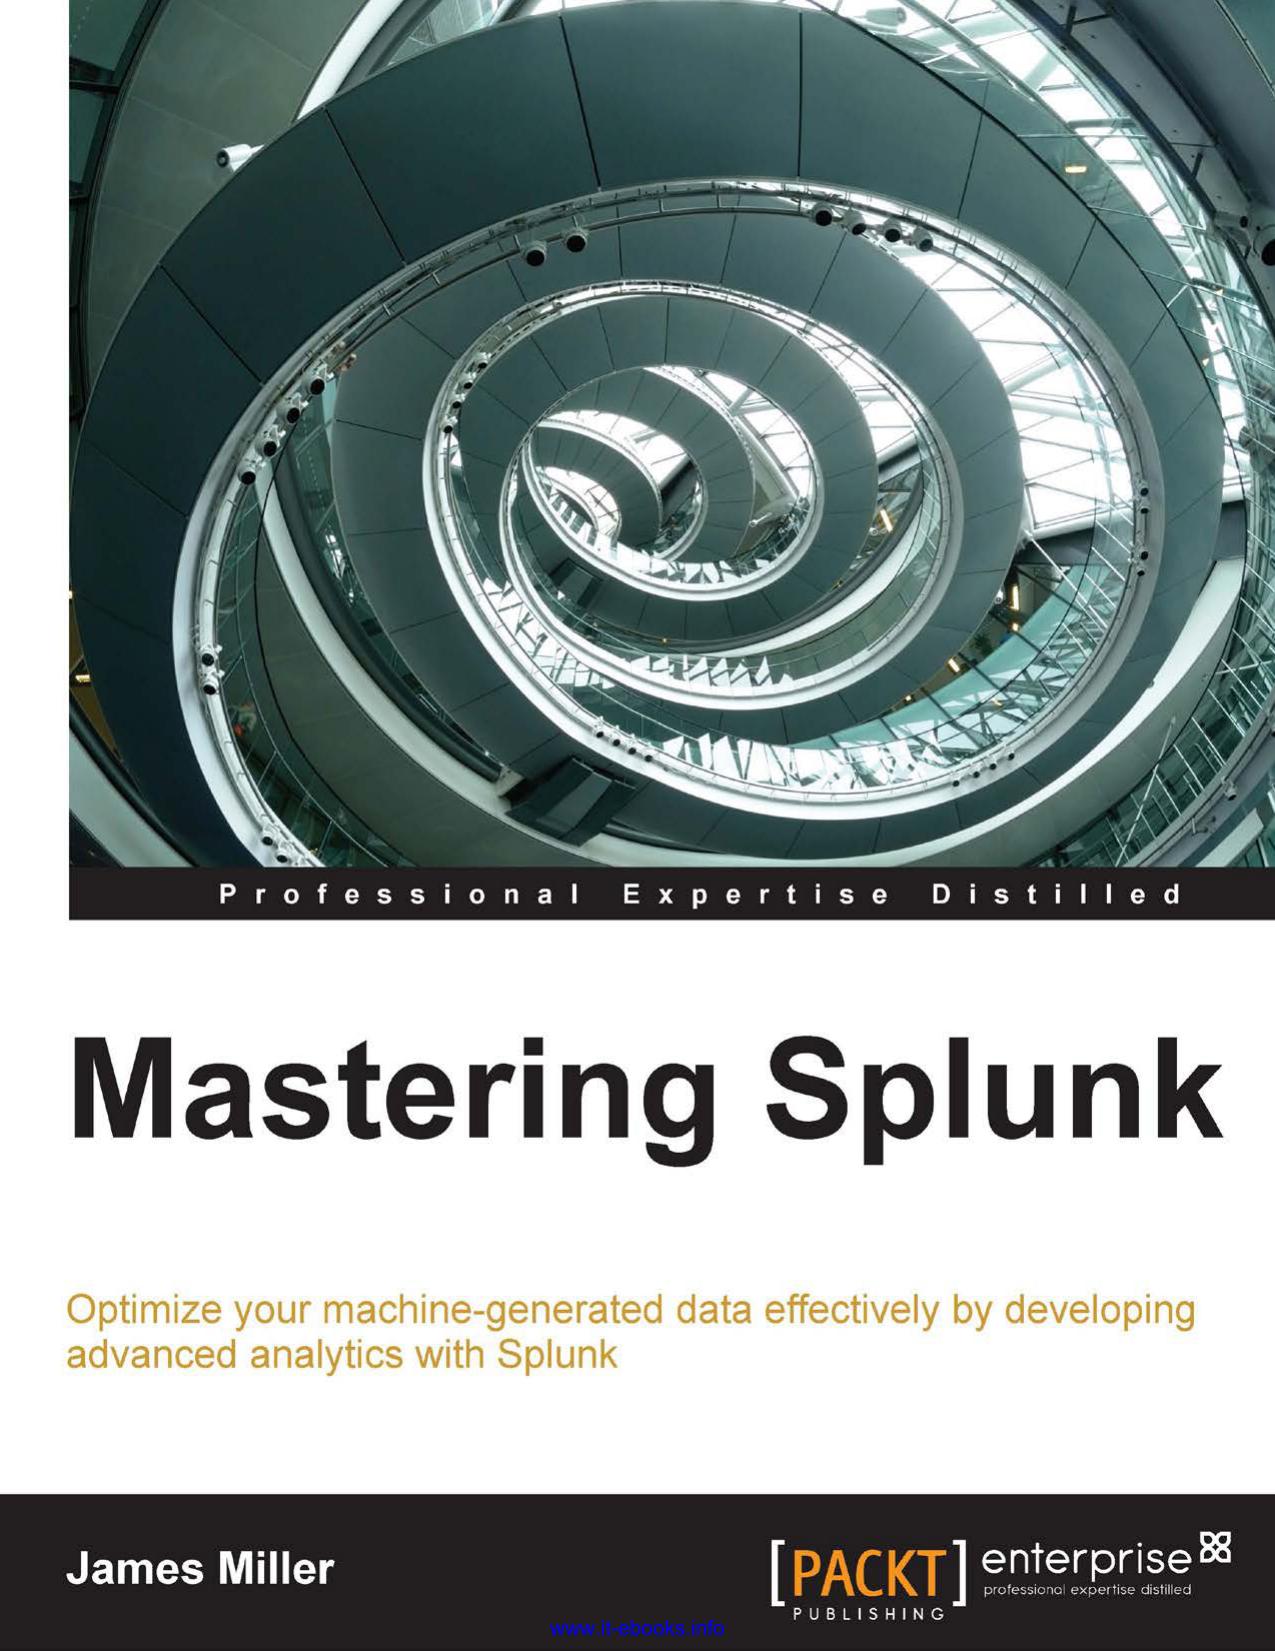 Mastering Splunk | manualzz com